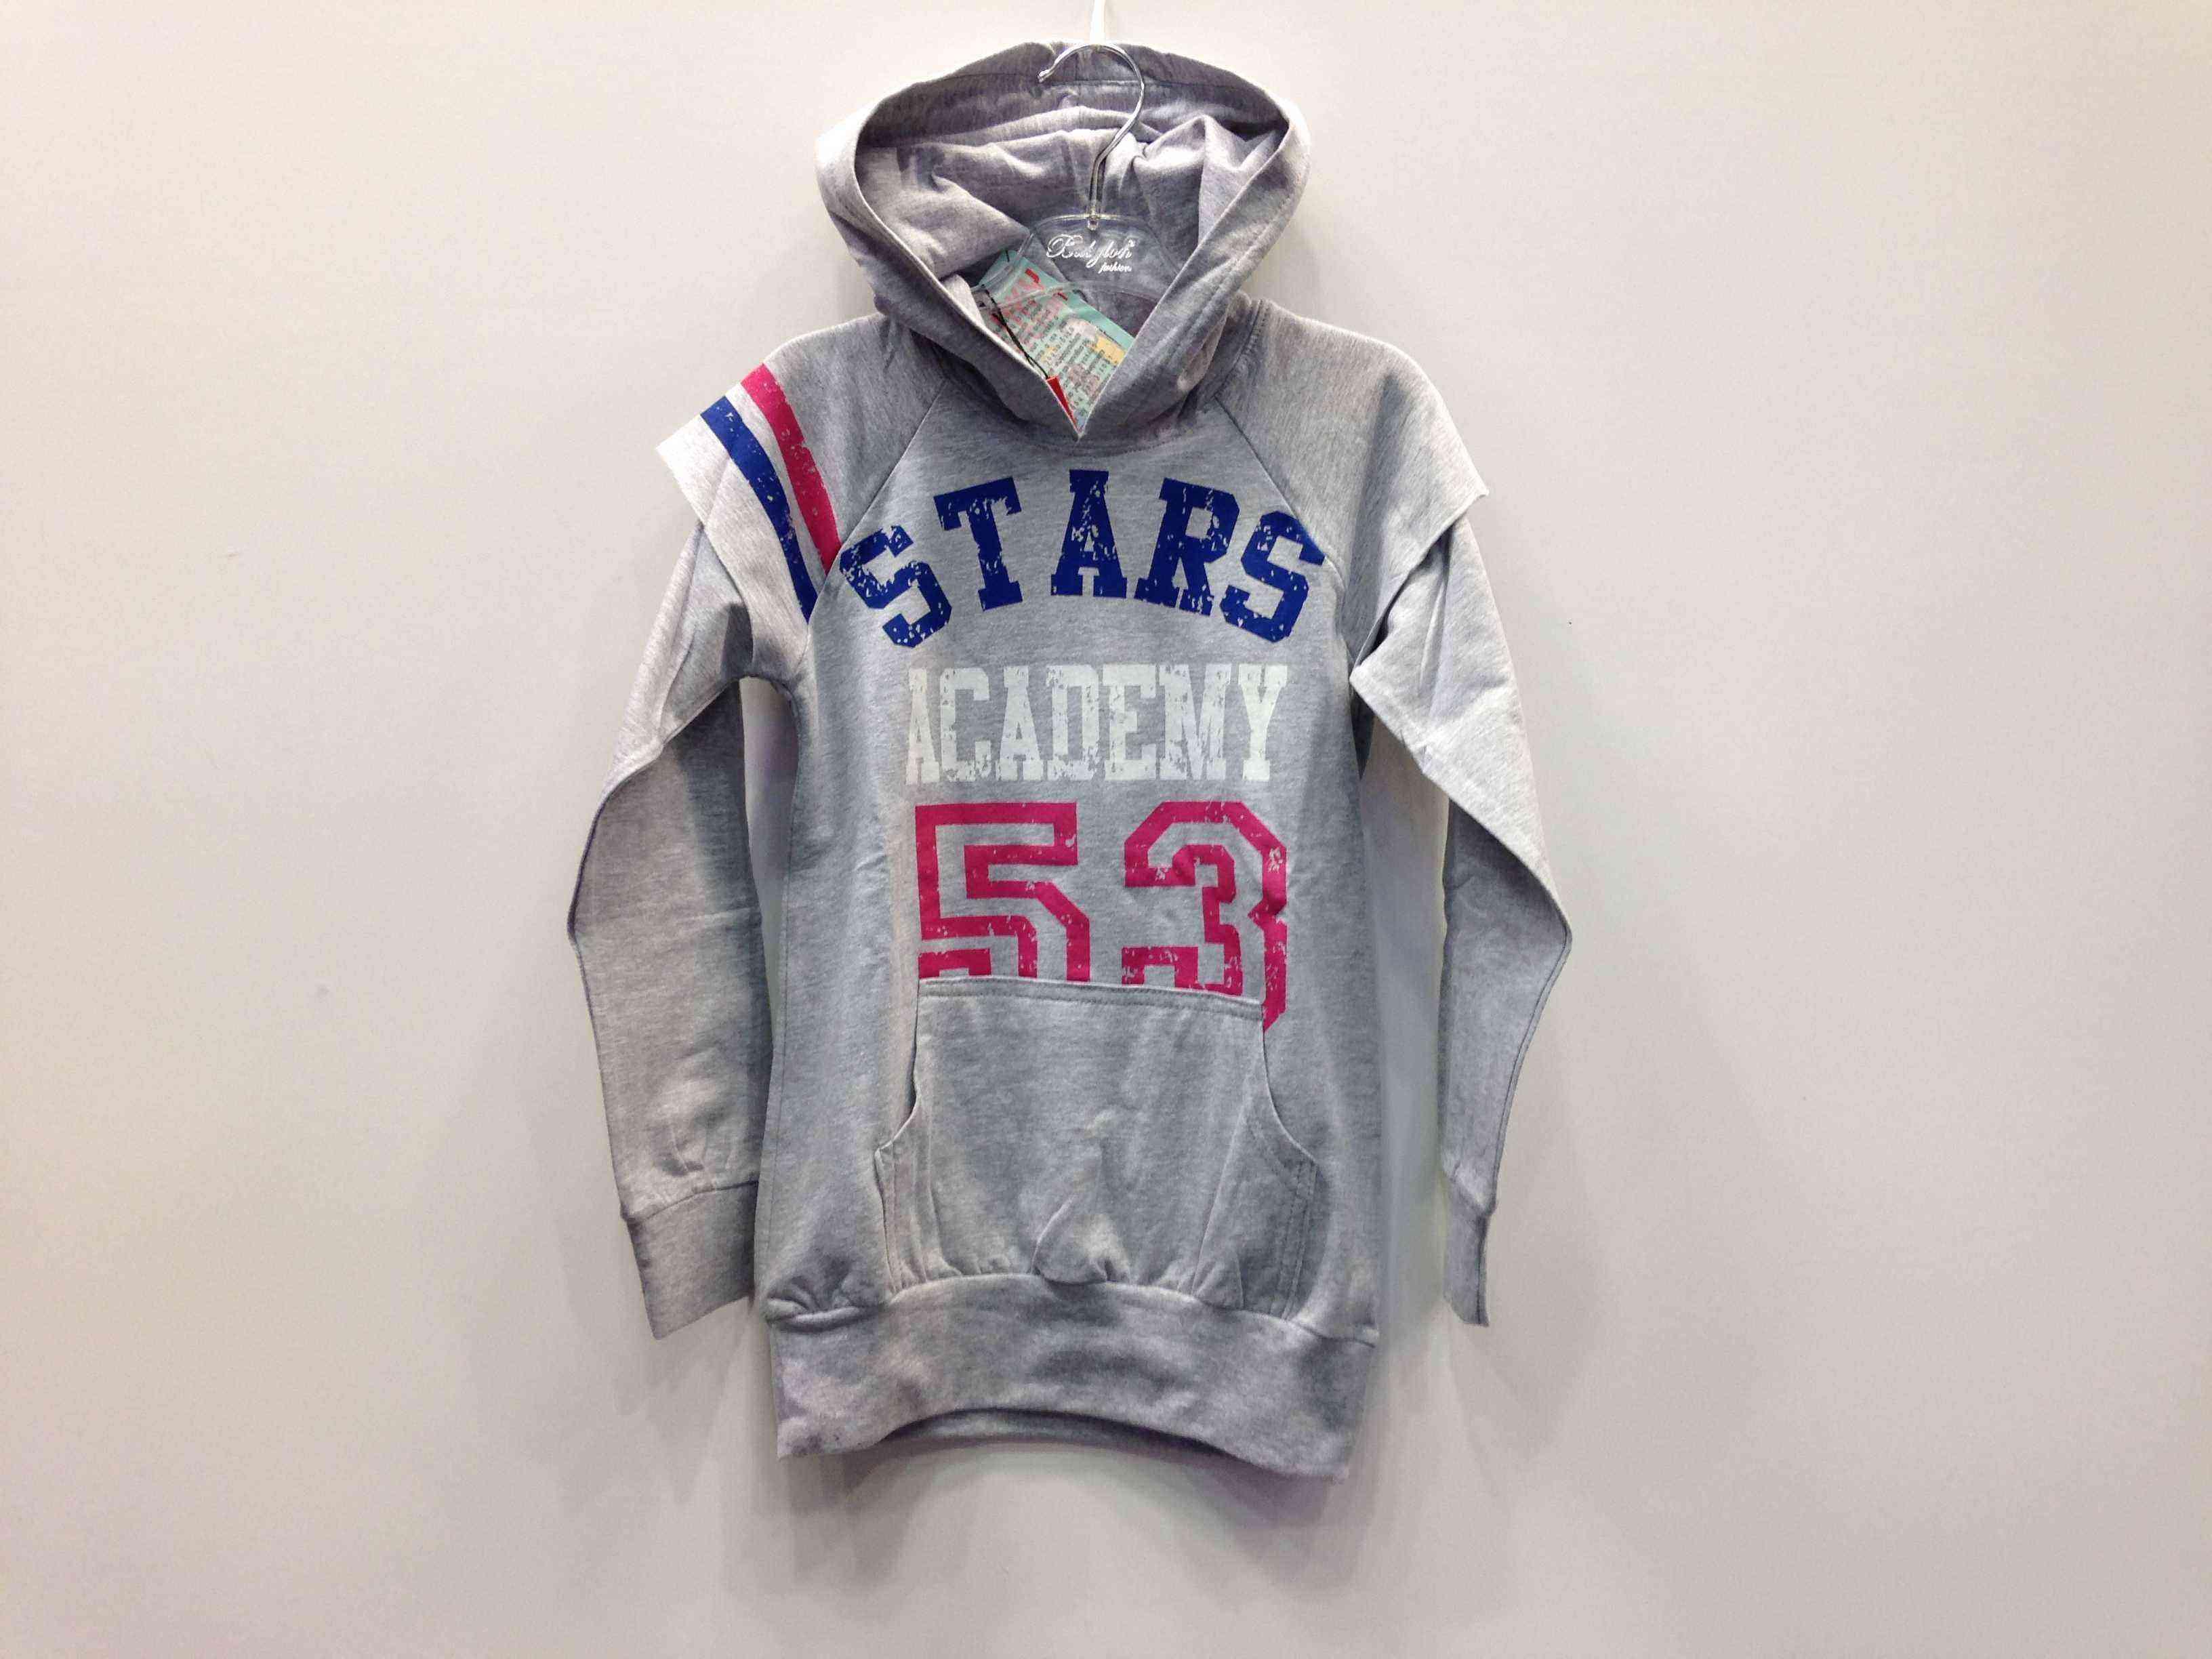 826f181c7d7a FUNKY Μπλουζοφόρεμα - κολάν αθλητικό με κουκούλα και τσέπη μάρσιπο -